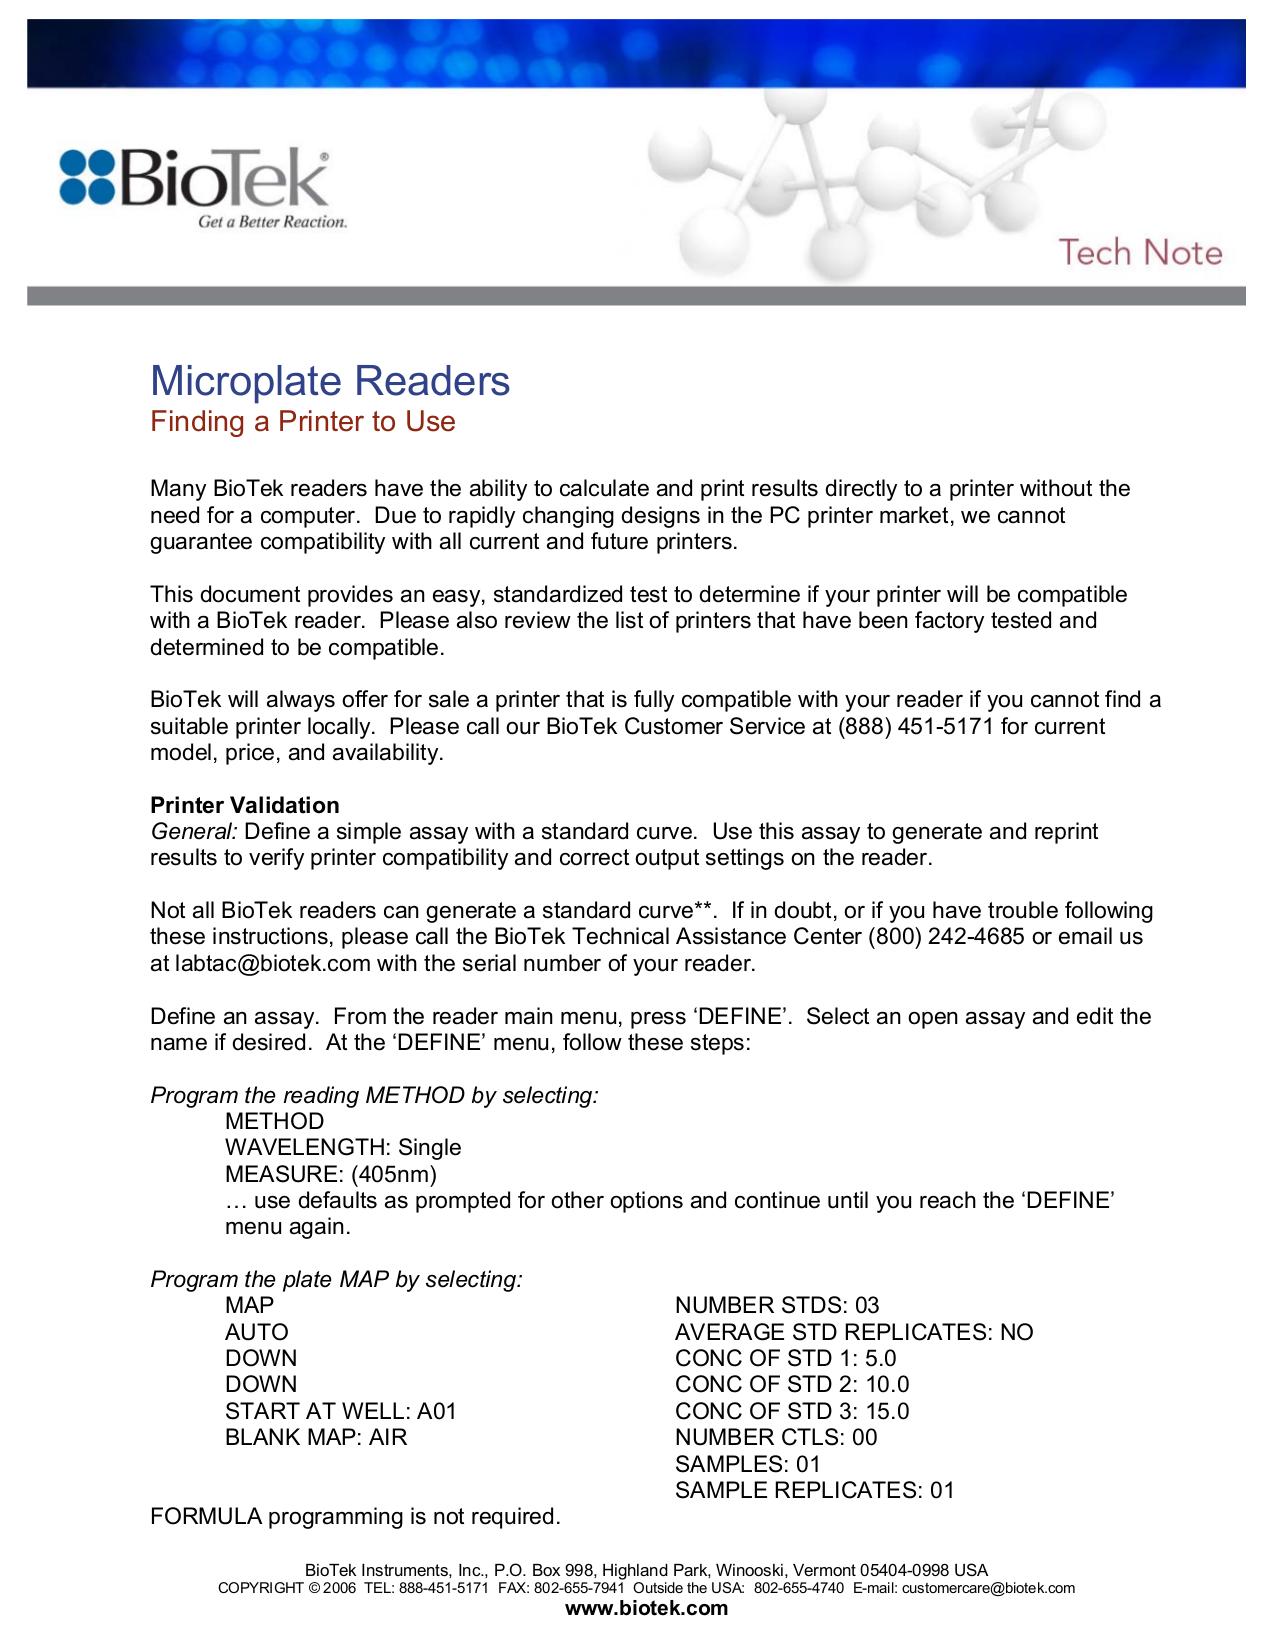 Download Free Pdf For HP Deskjet 1120cse Printer Manual